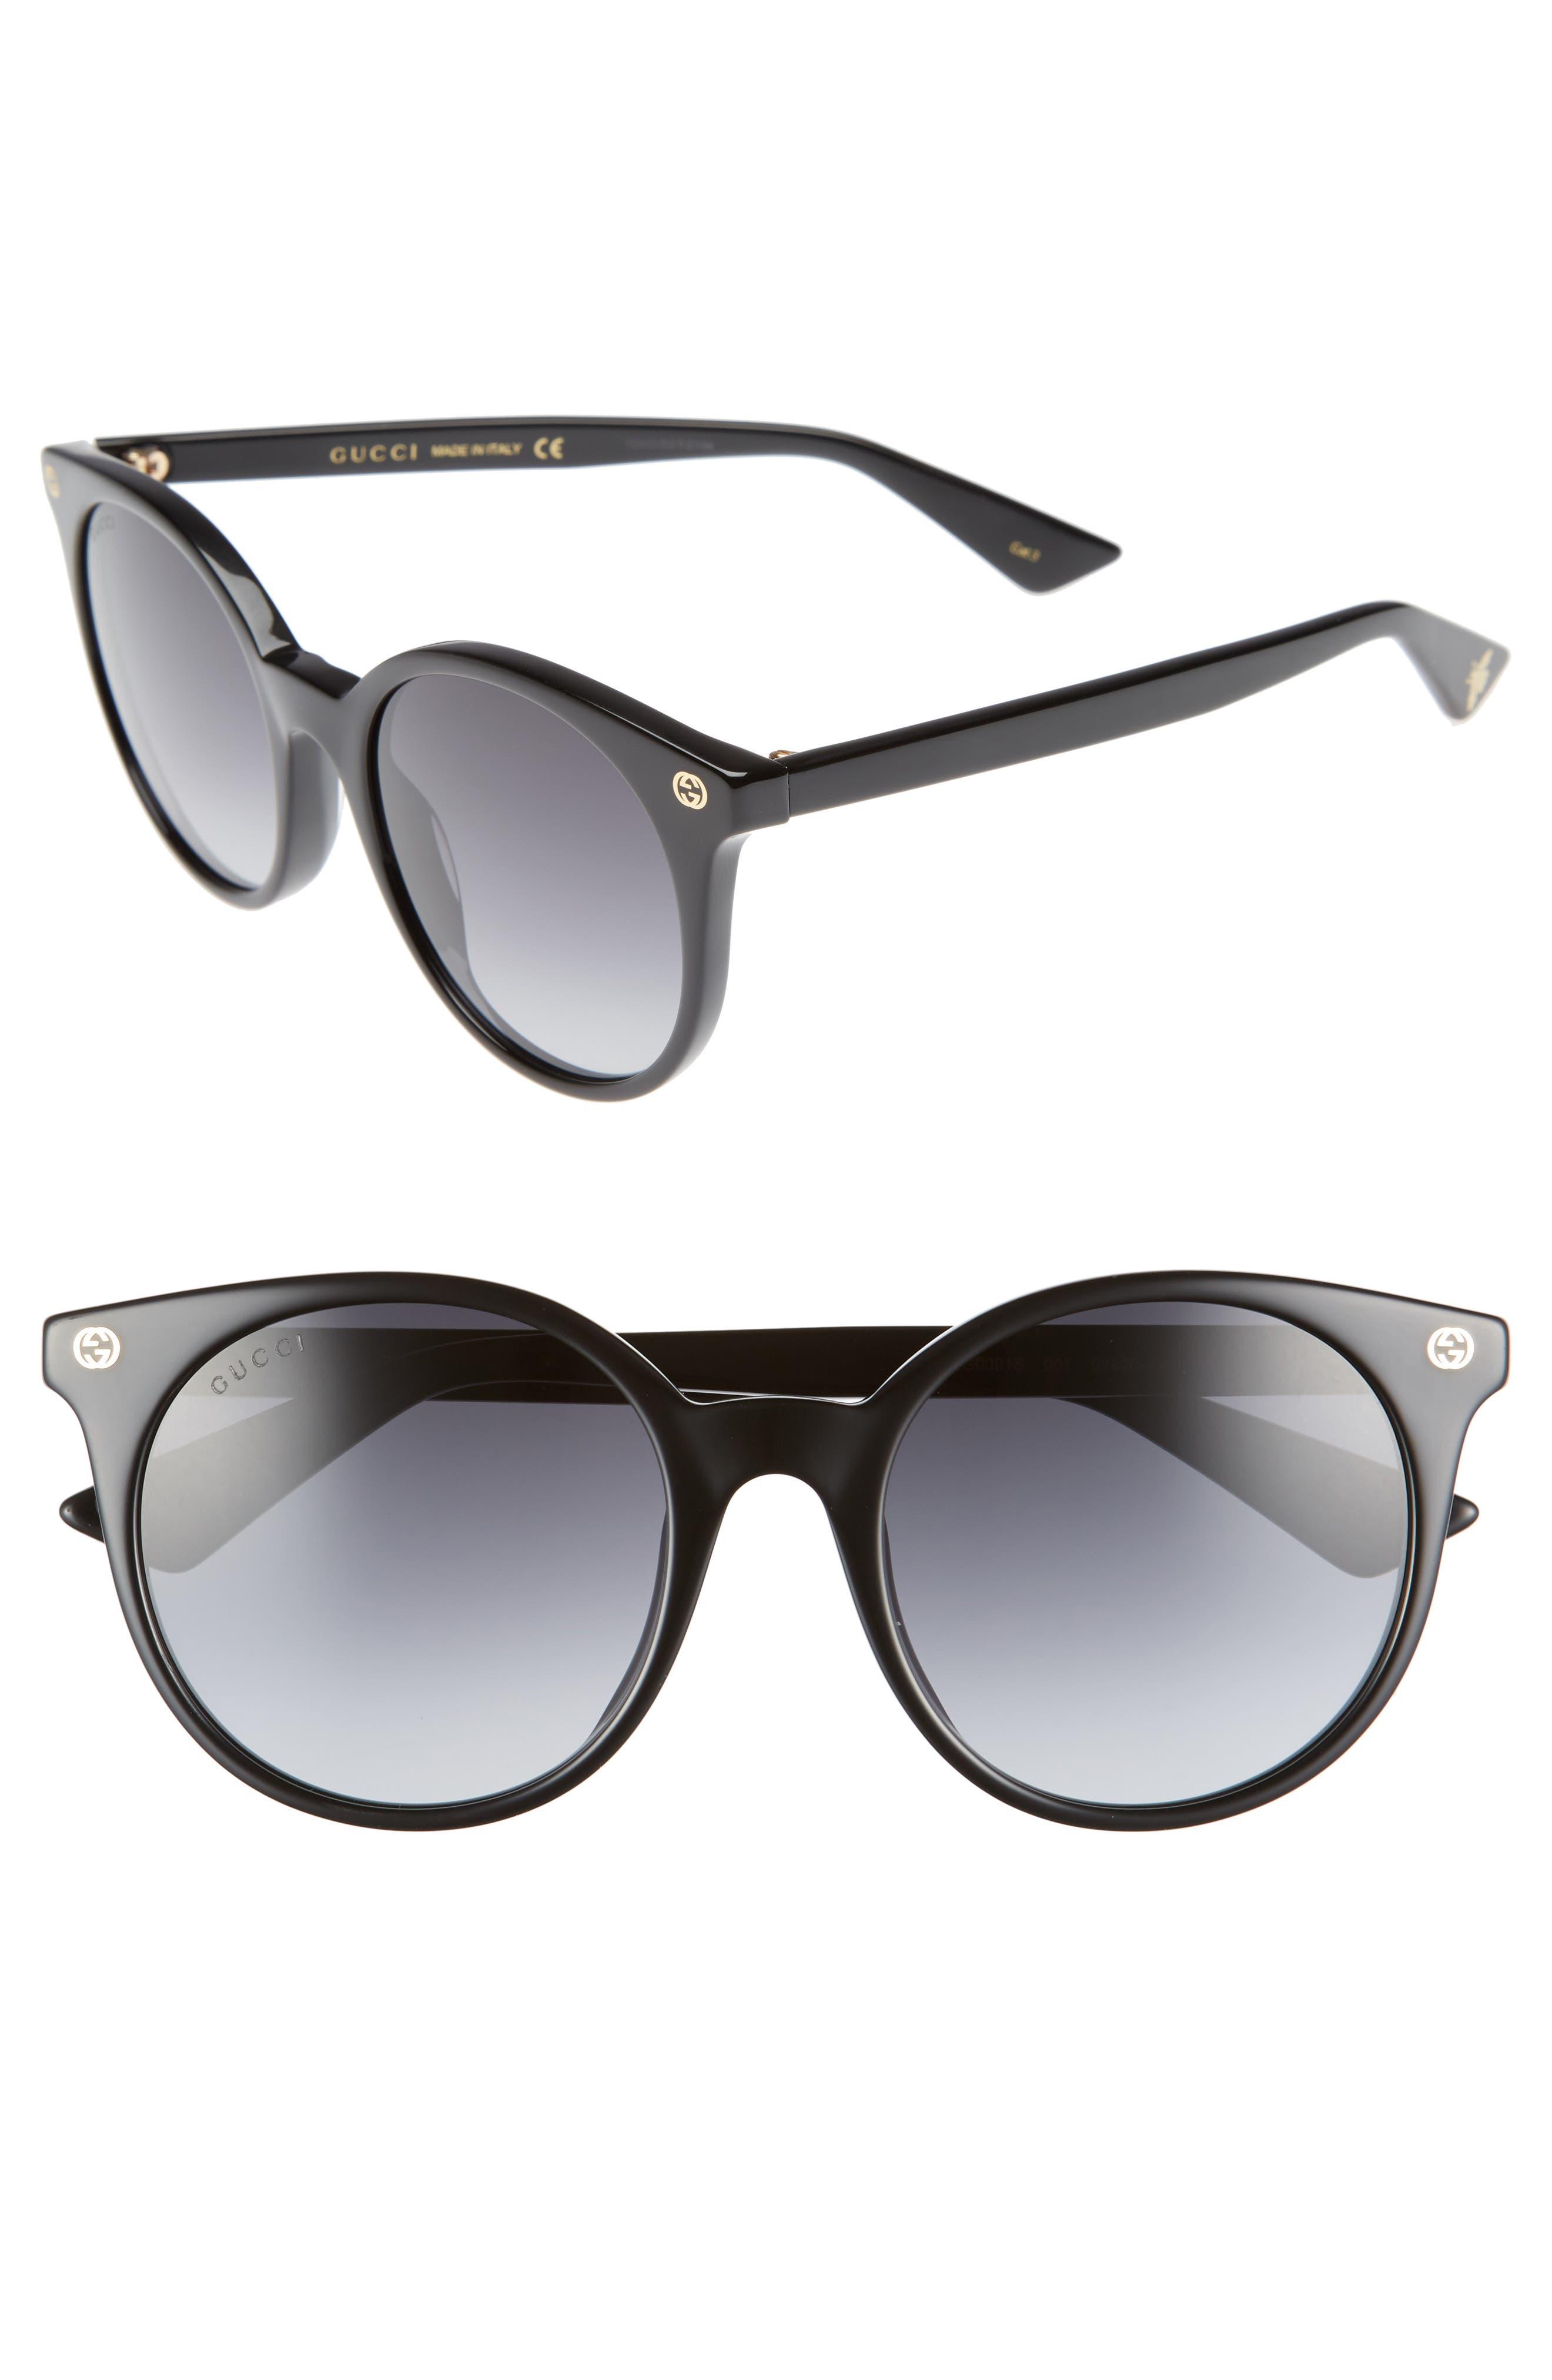 52mm Round Sunglasses,                             Main thumbnail 1, color,